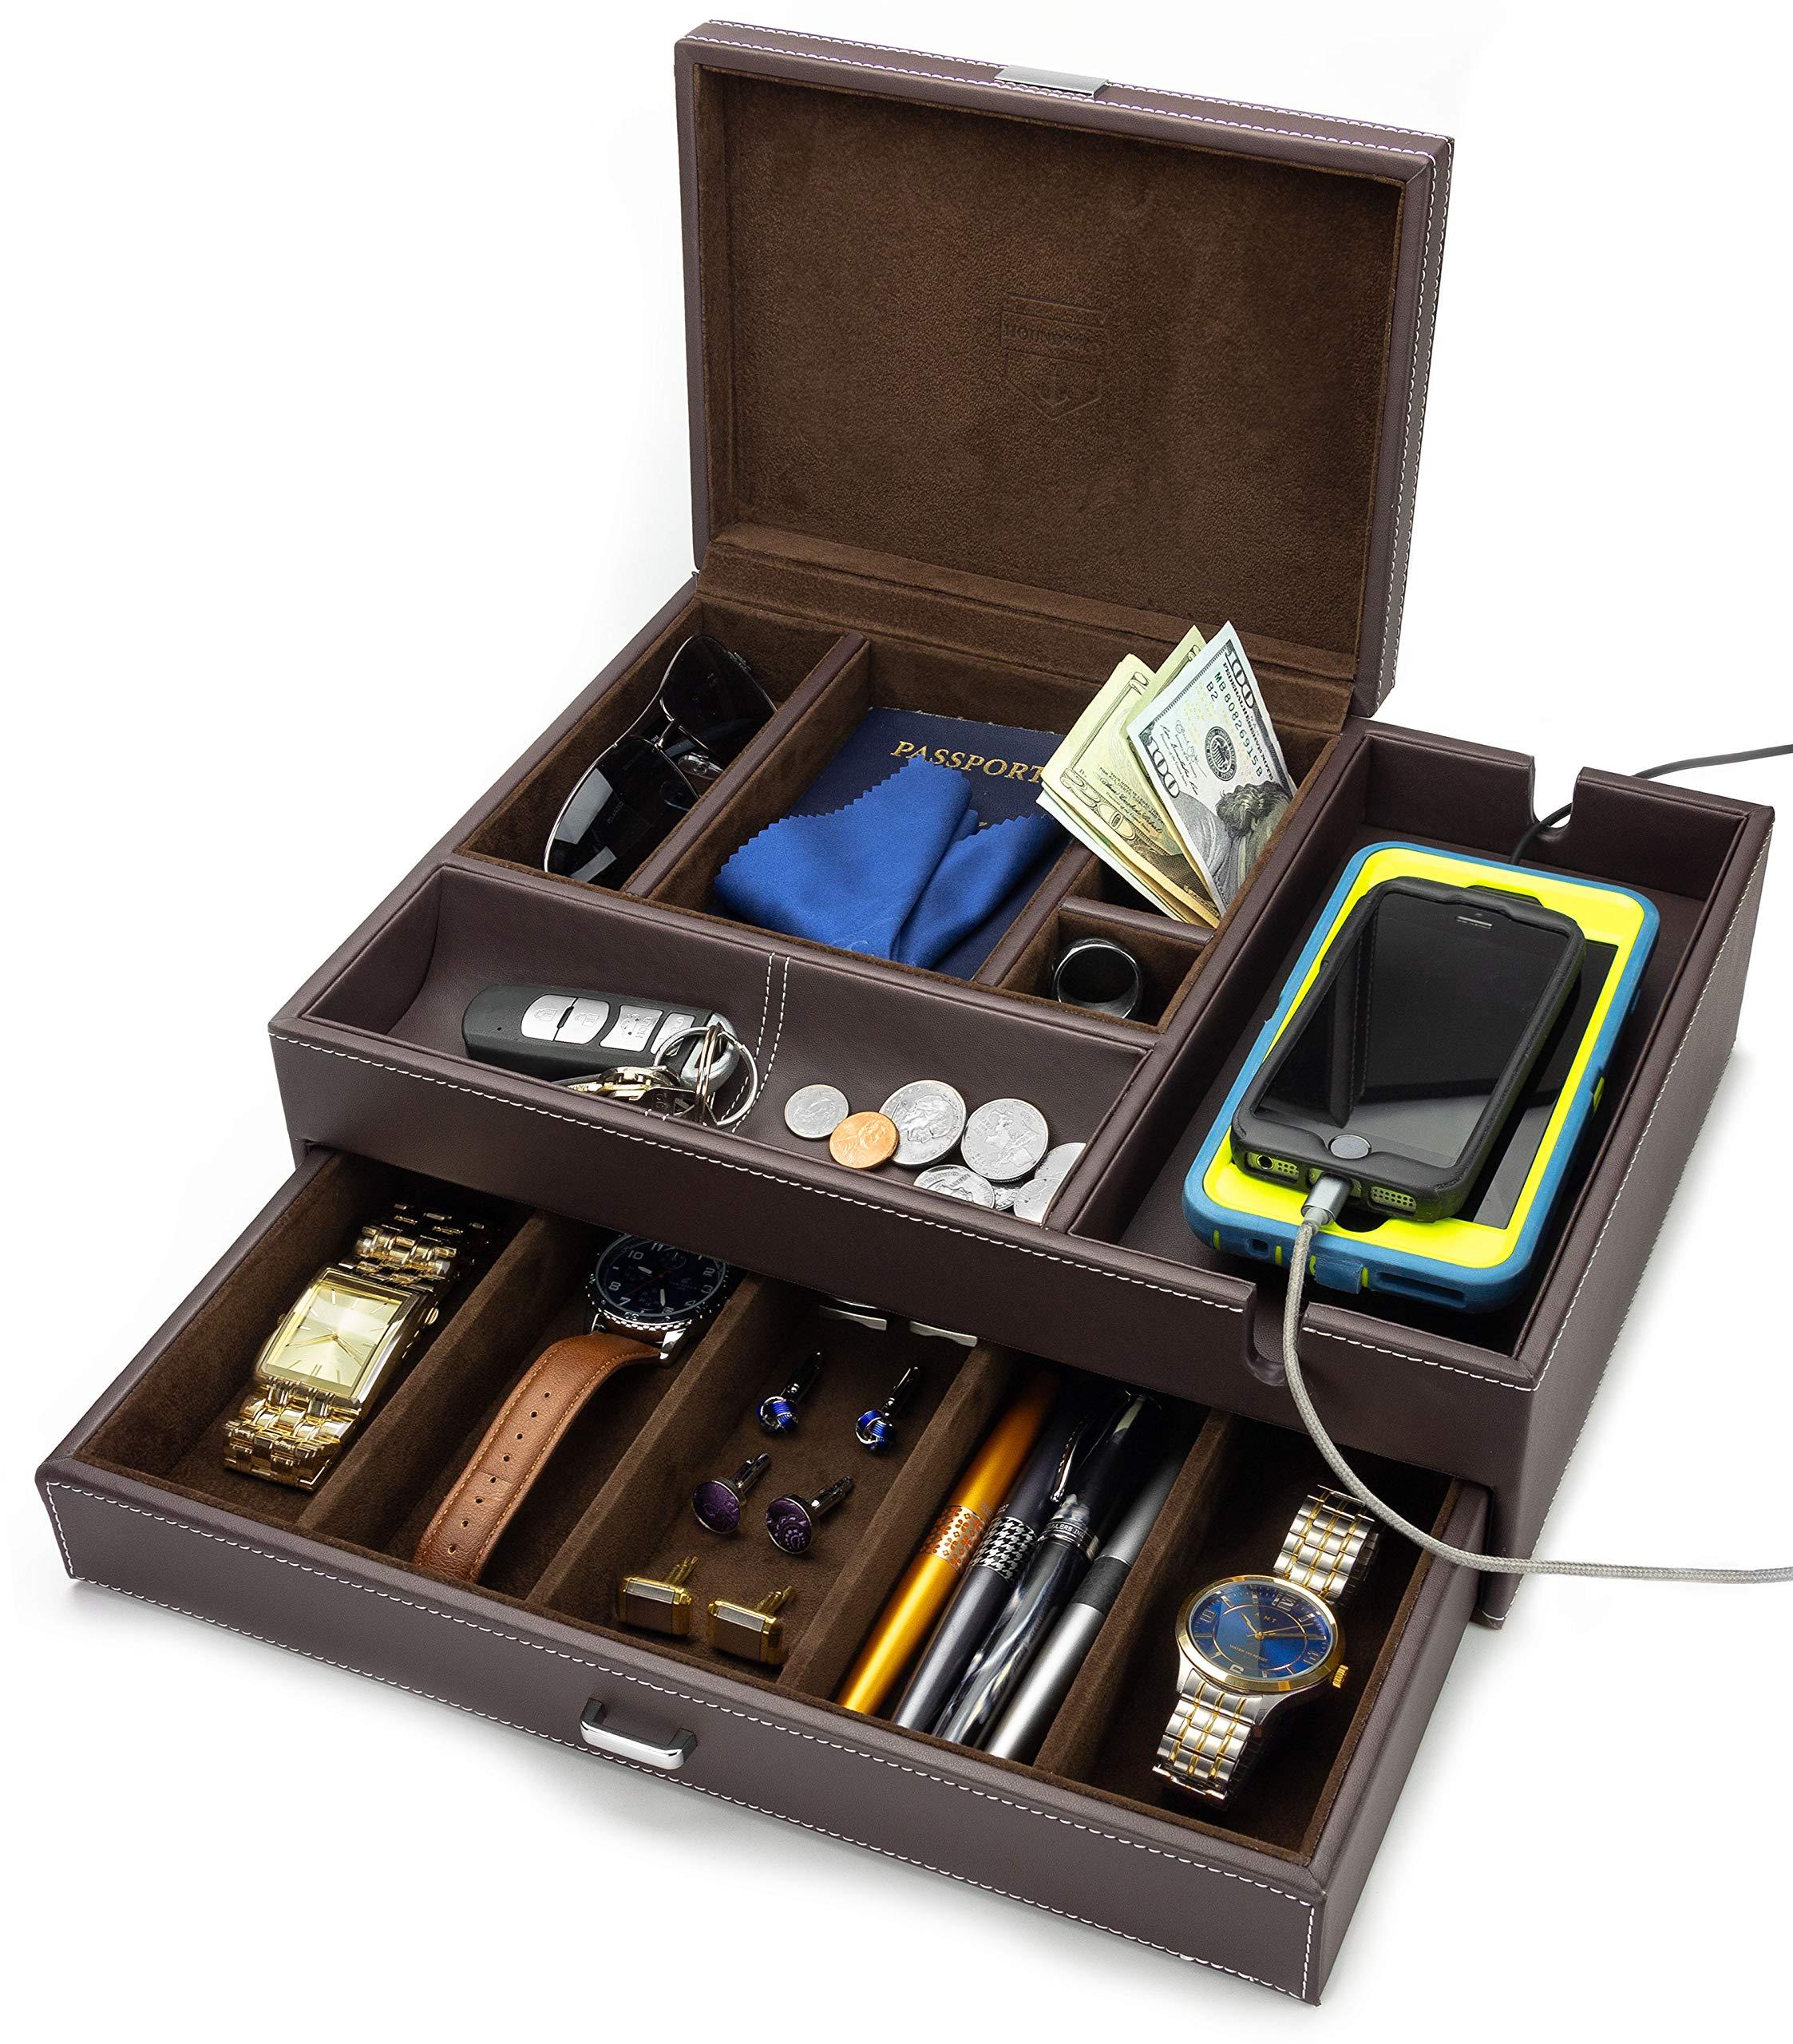 HOUNDSBAY Admiral Big Dresser Valet Box & Mens Jewelry Box Organizer with Large Smartphone Charging Station (Dark Brown) by HOUNDSBAY